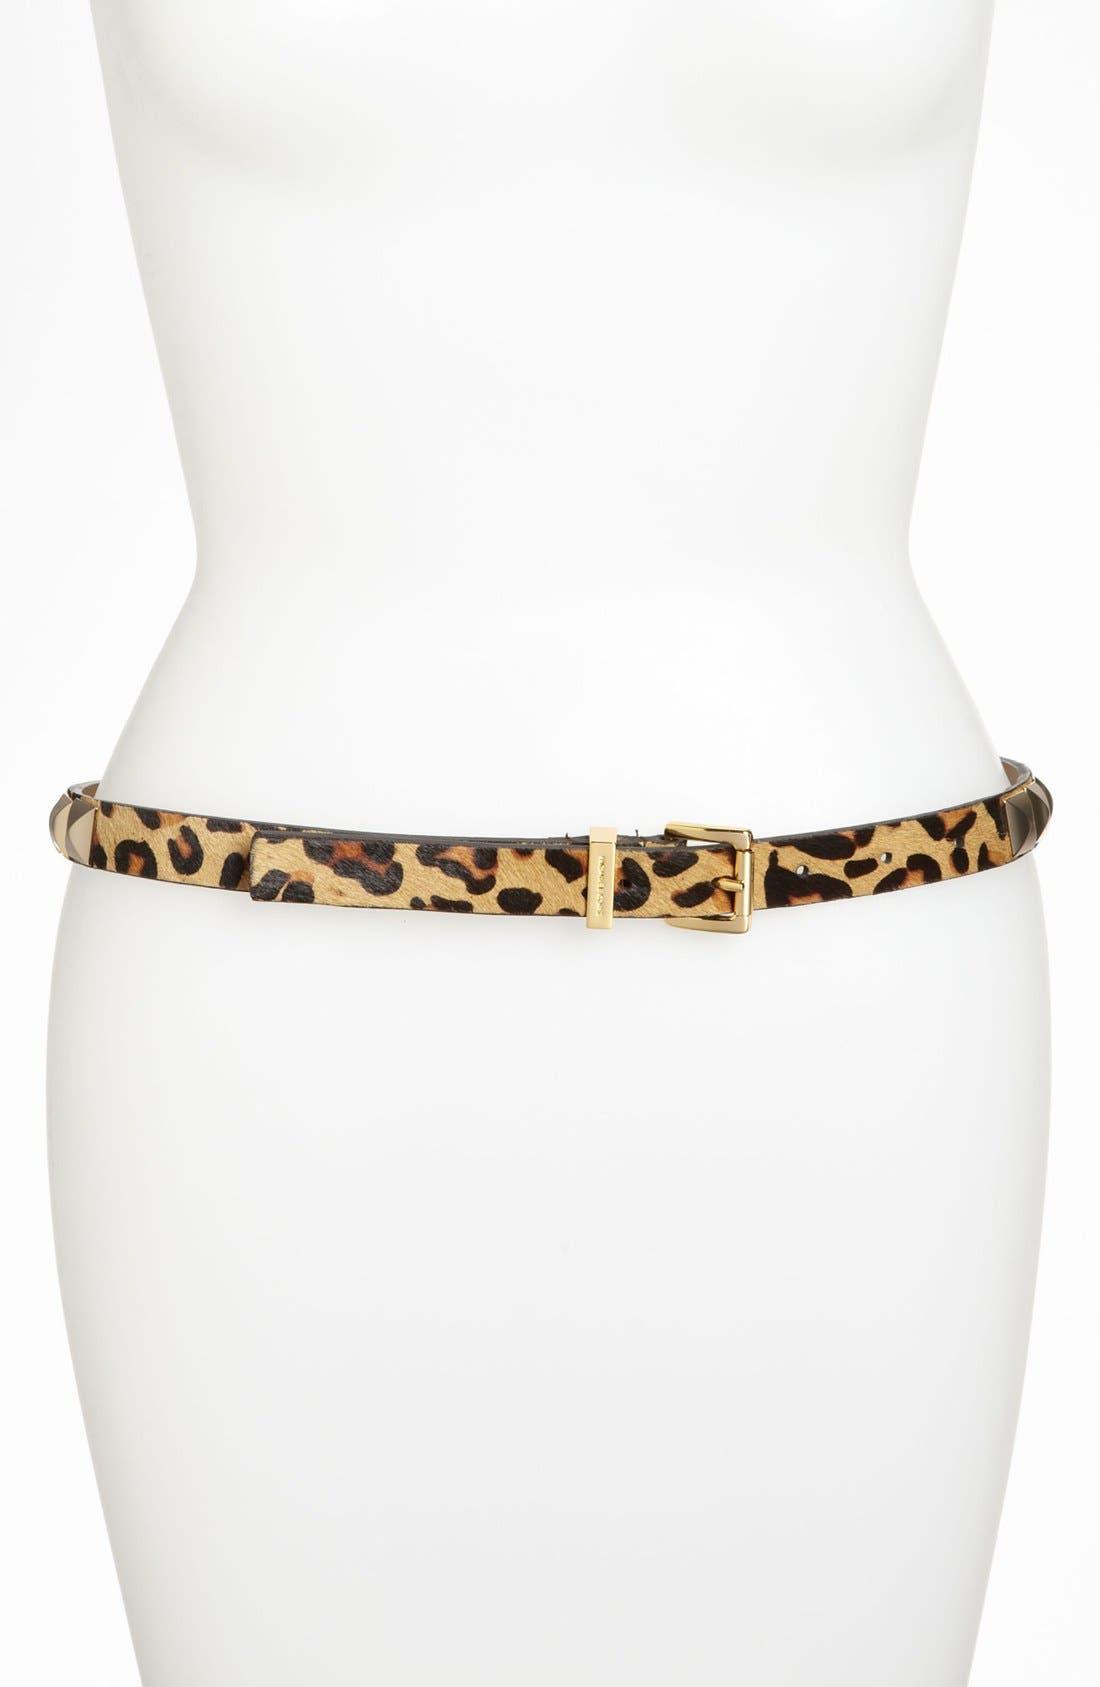 Main Image - MICHAEL Michael Kors Studded Calf Hair Belt